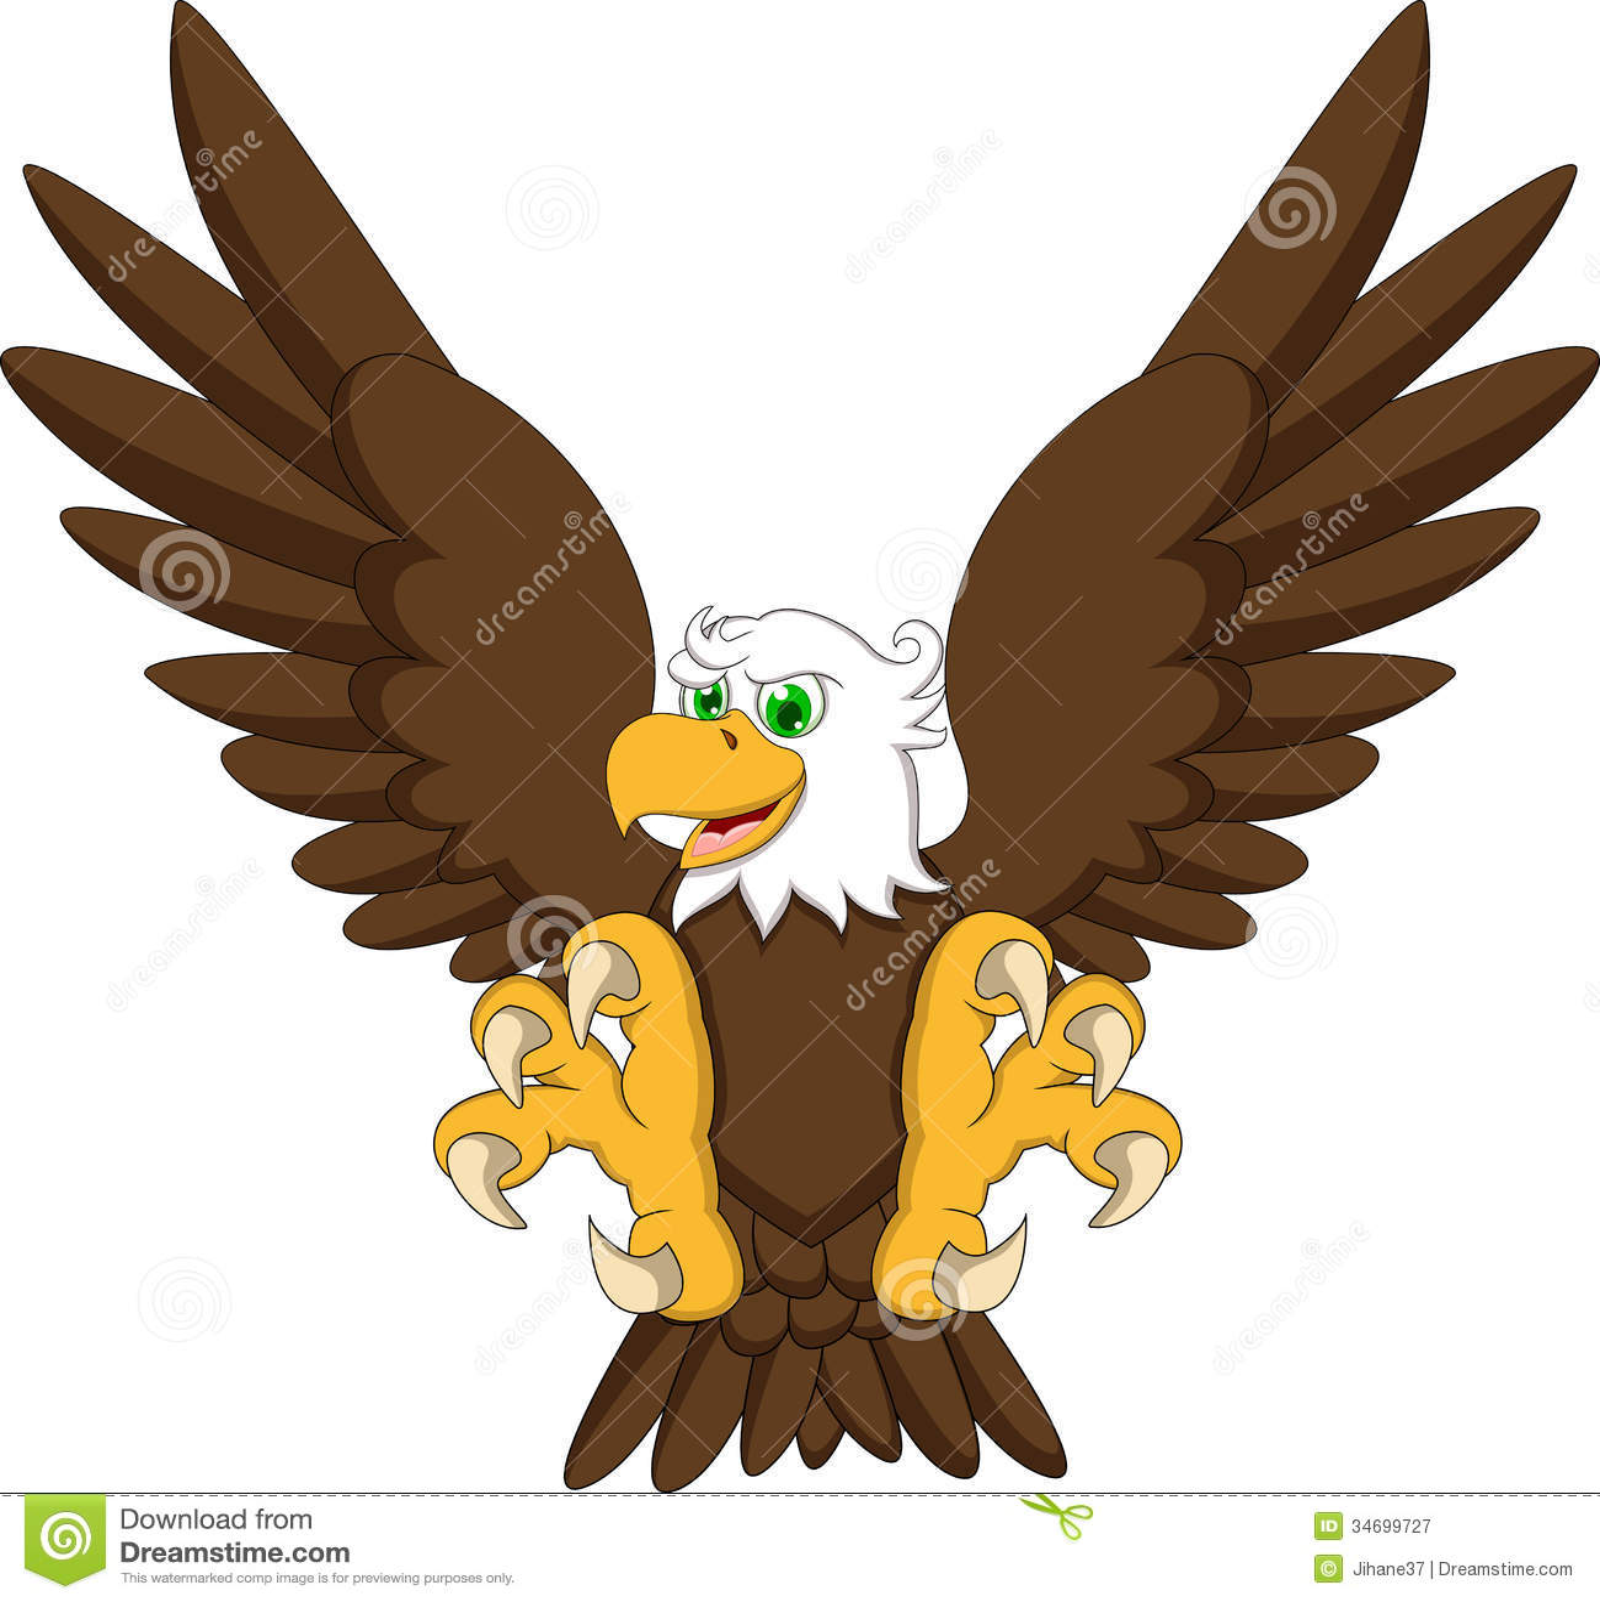 Cartoon Eagle Flying | www.imgkid.com - The Image Kid Has It!  Baby